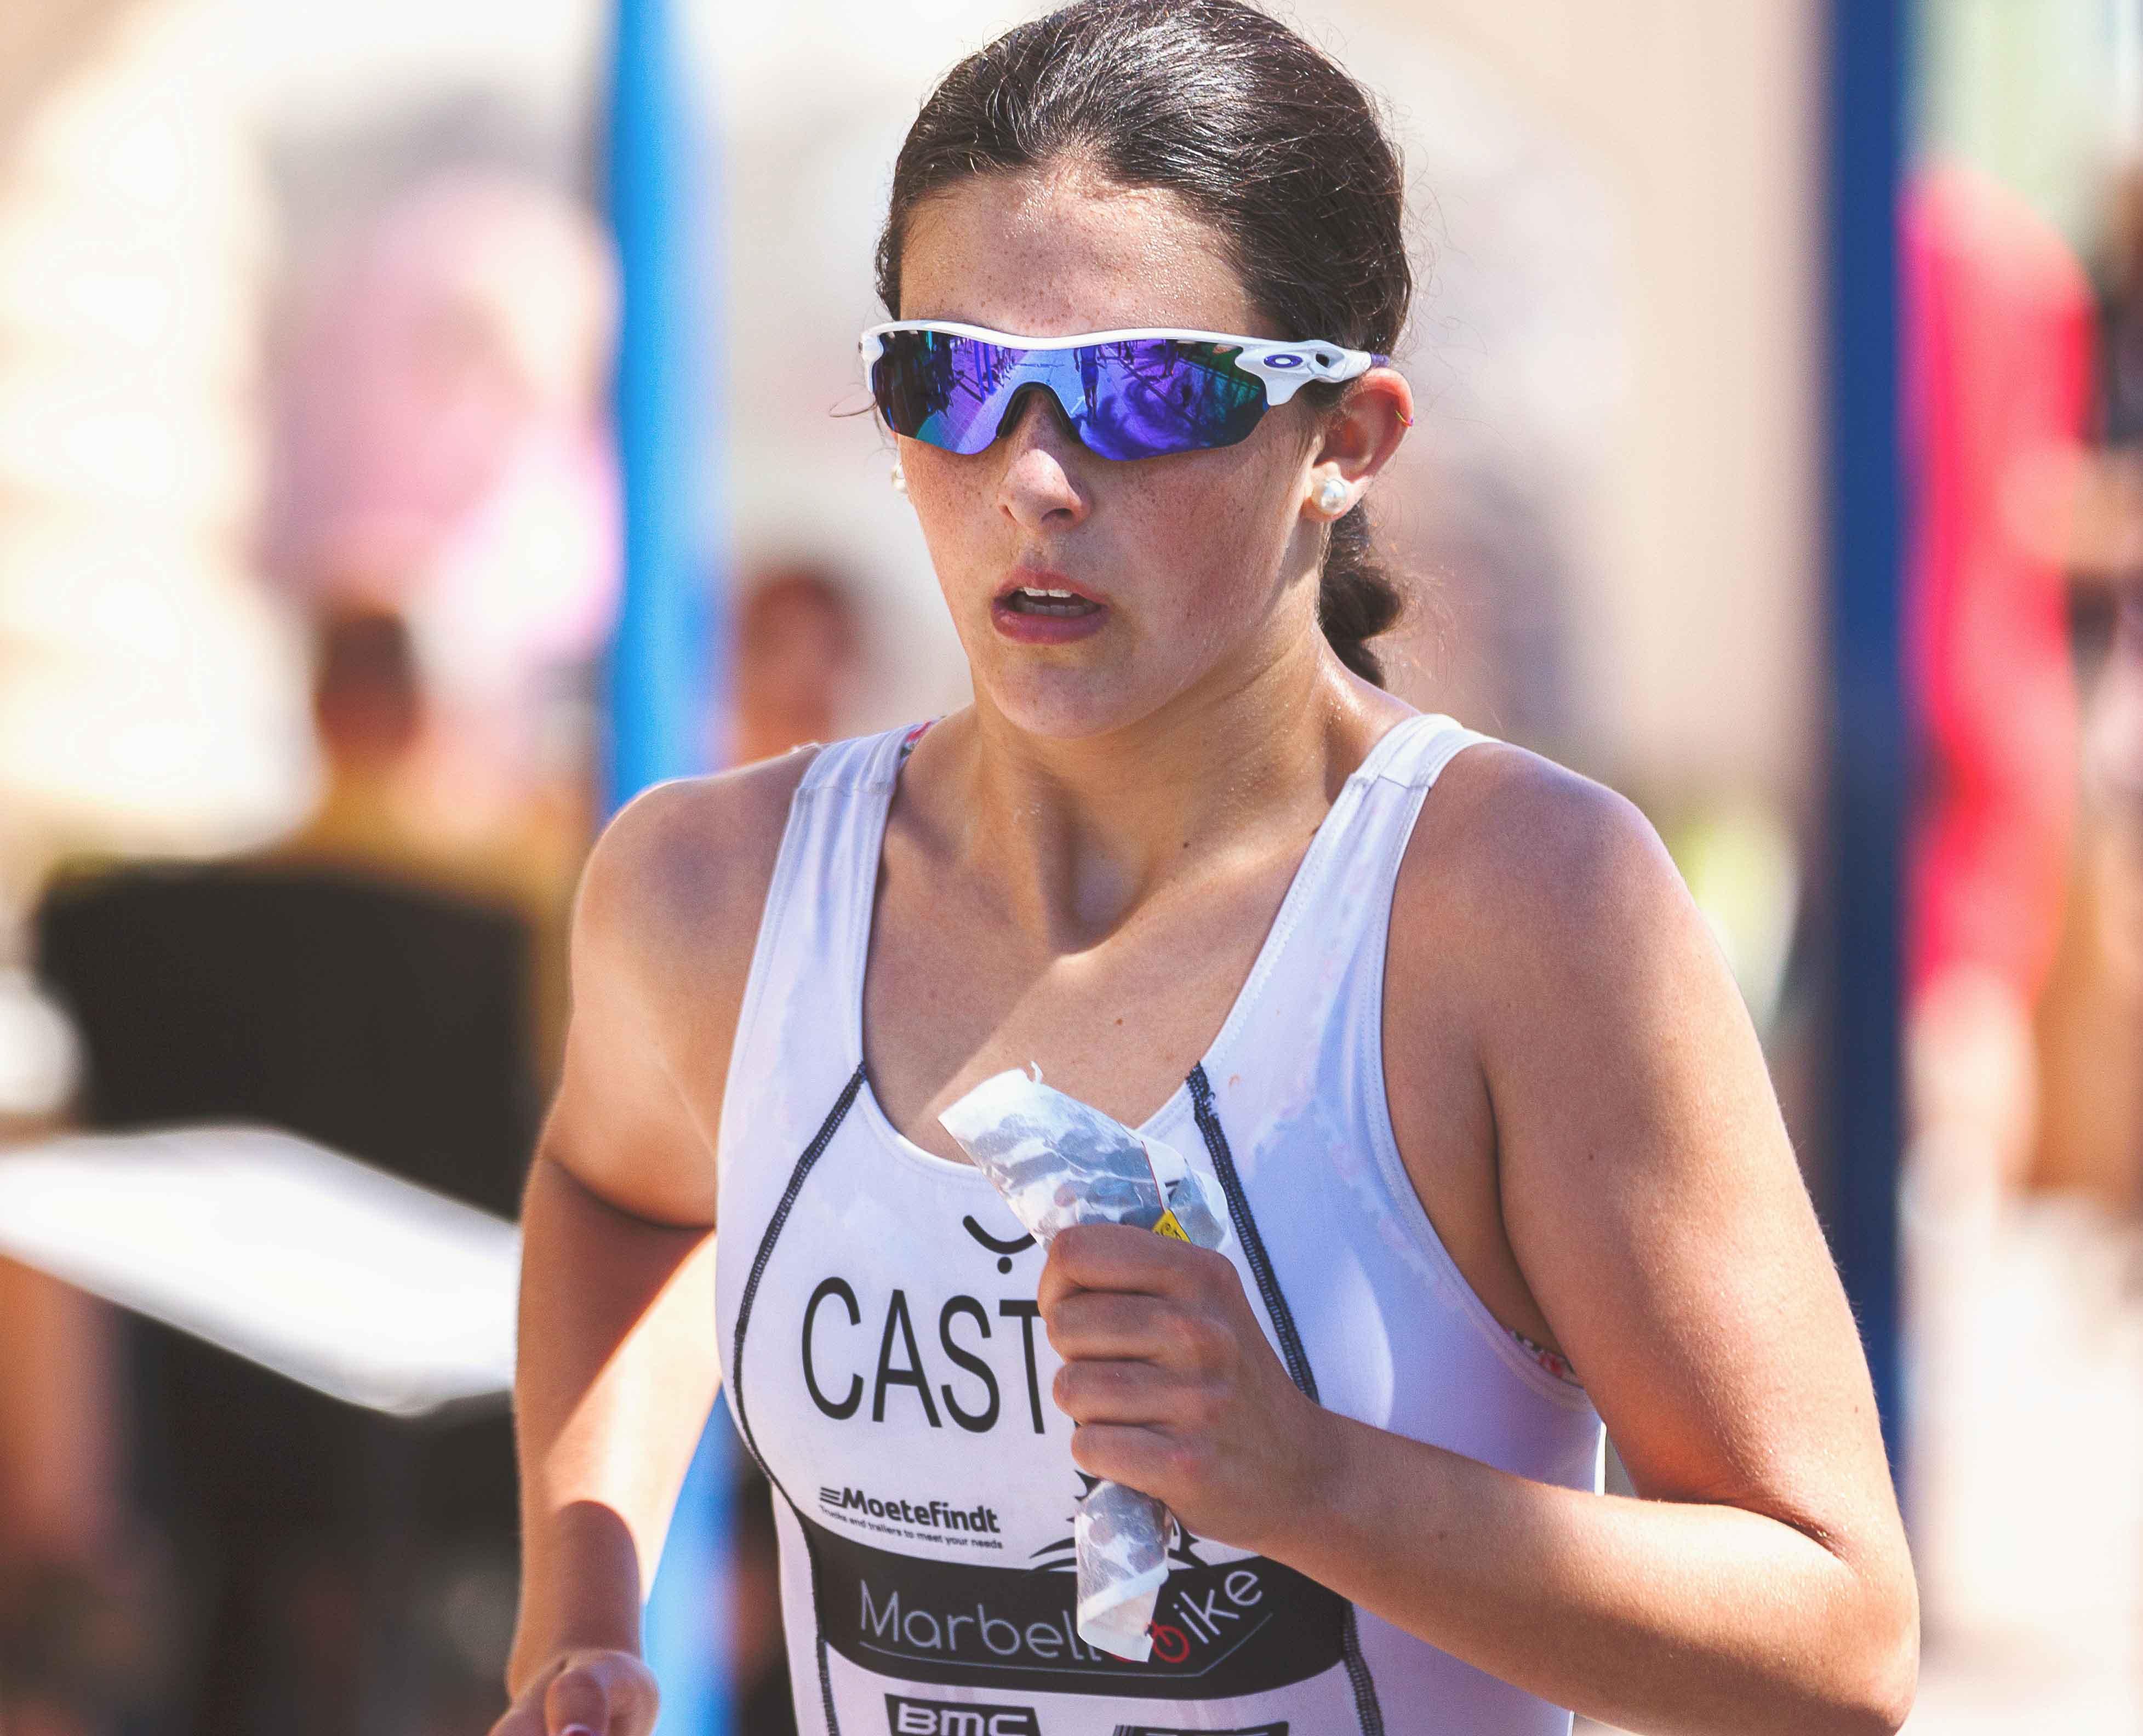 professional runner